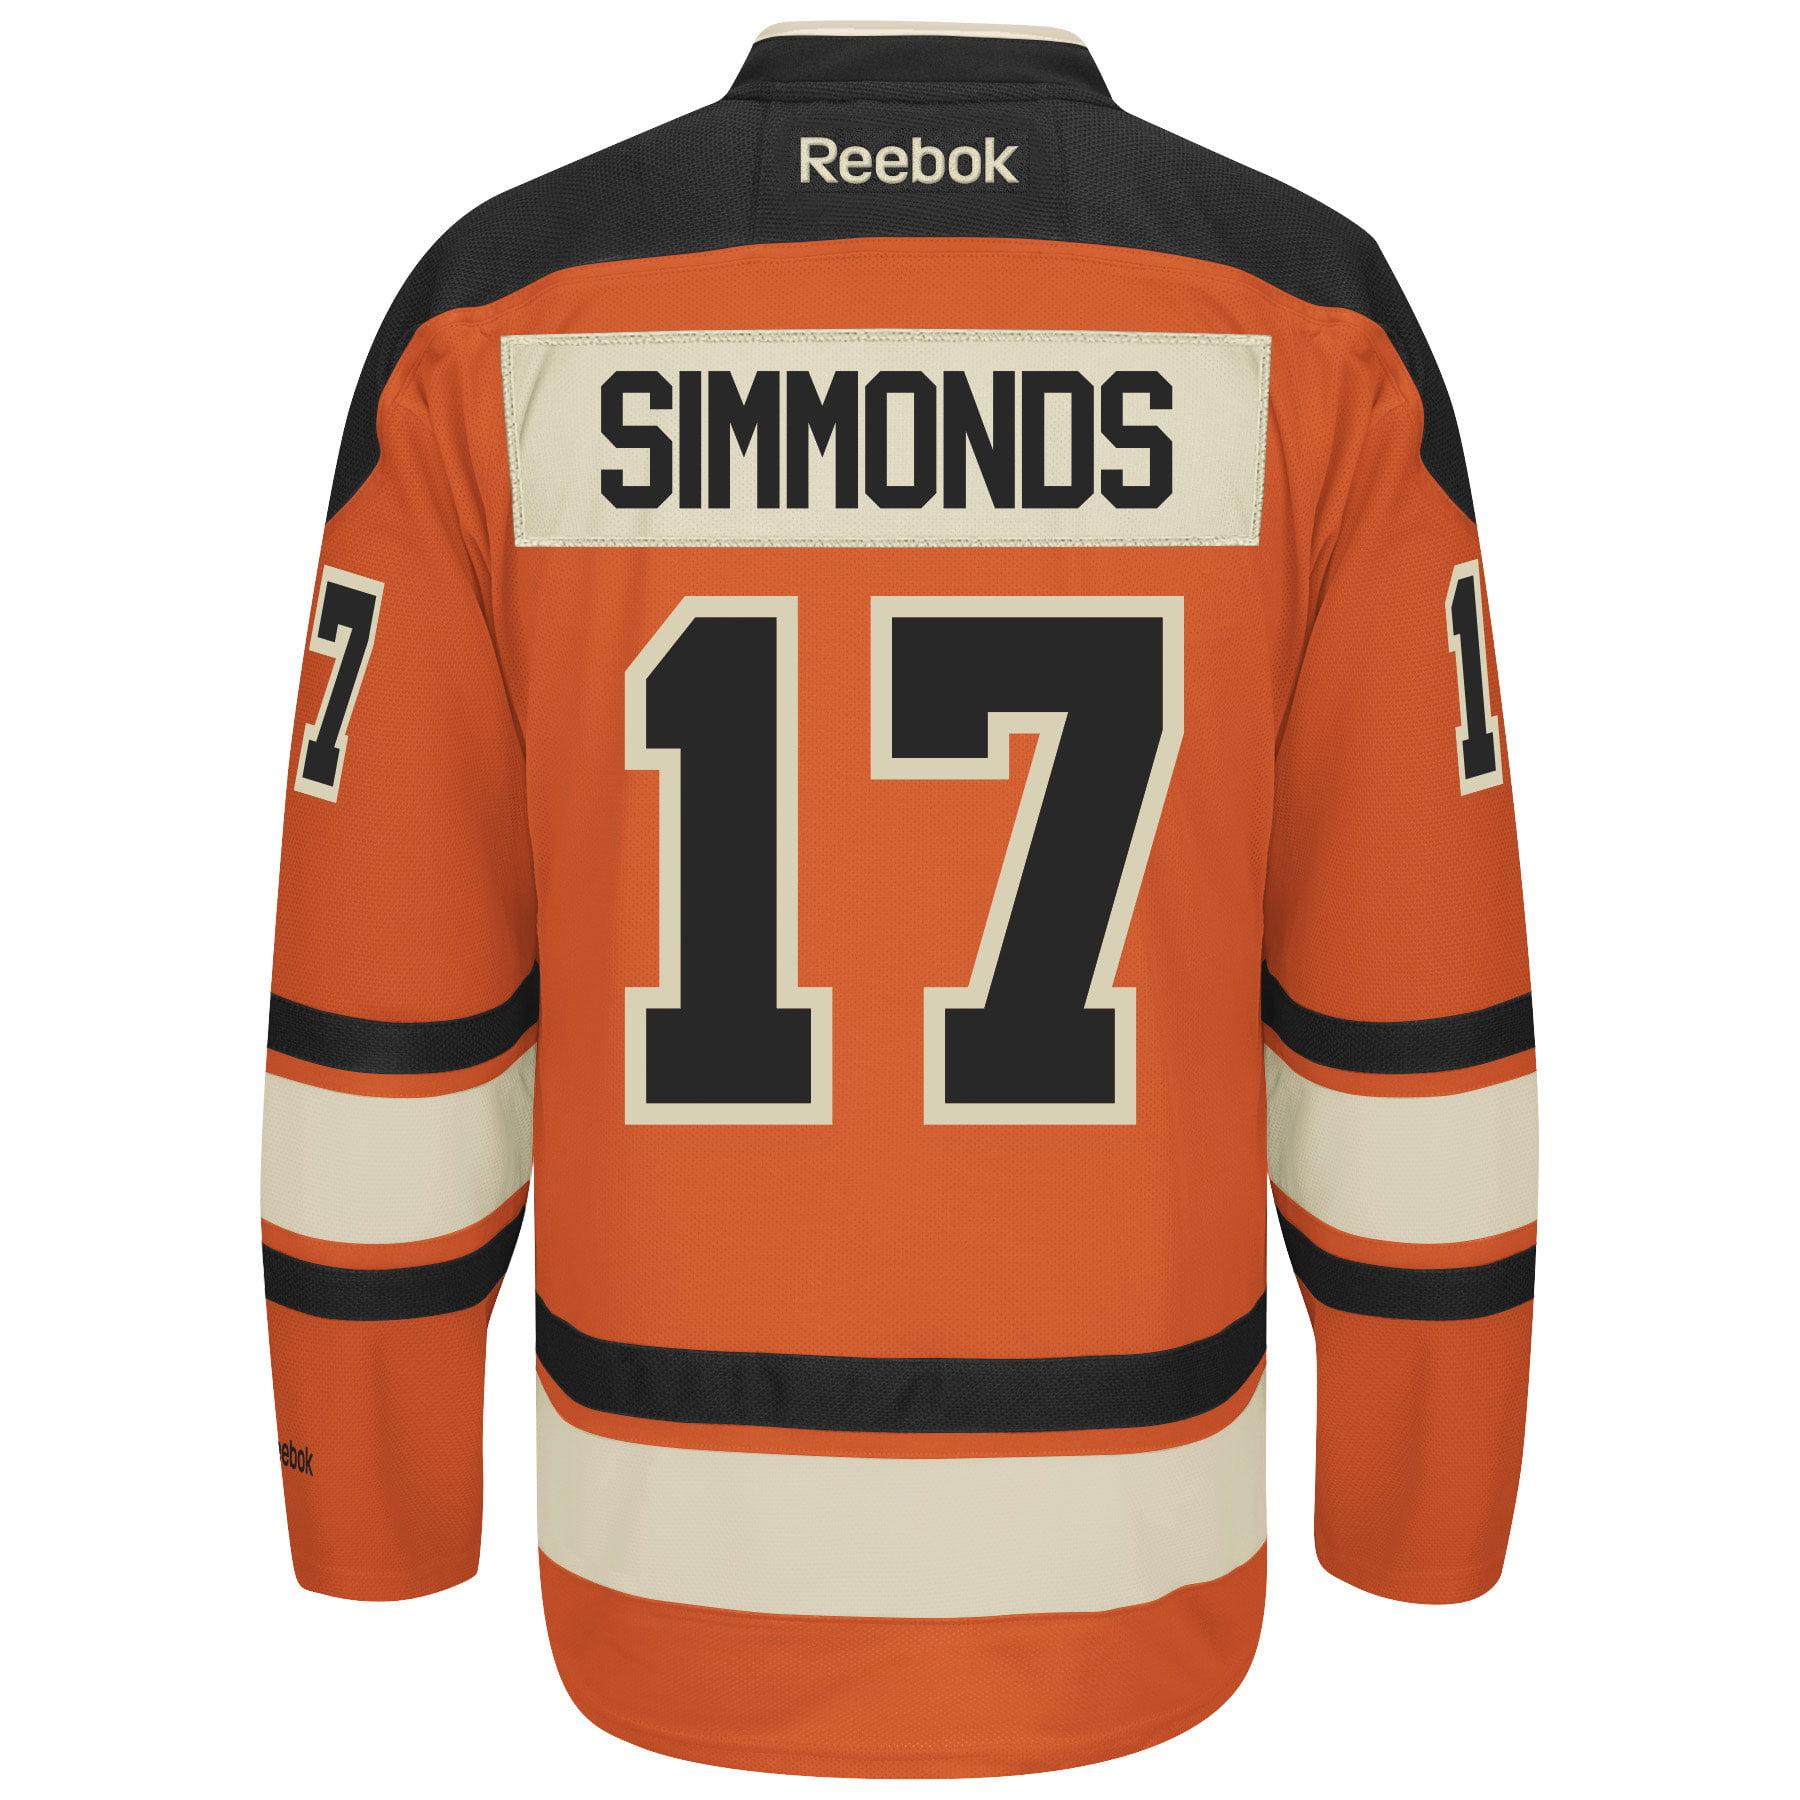 be3ef382e Wayne Simmonds Philadelphia Flyers Reebok Premier Replica Alternate NHL  Hockey Jersey | Walmart Canada